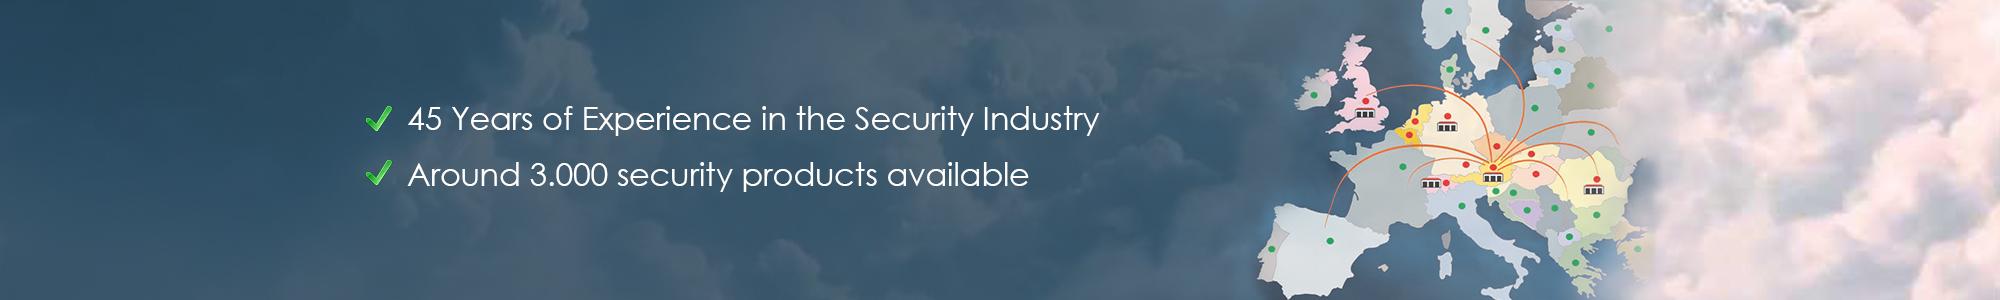 Rottner Security International